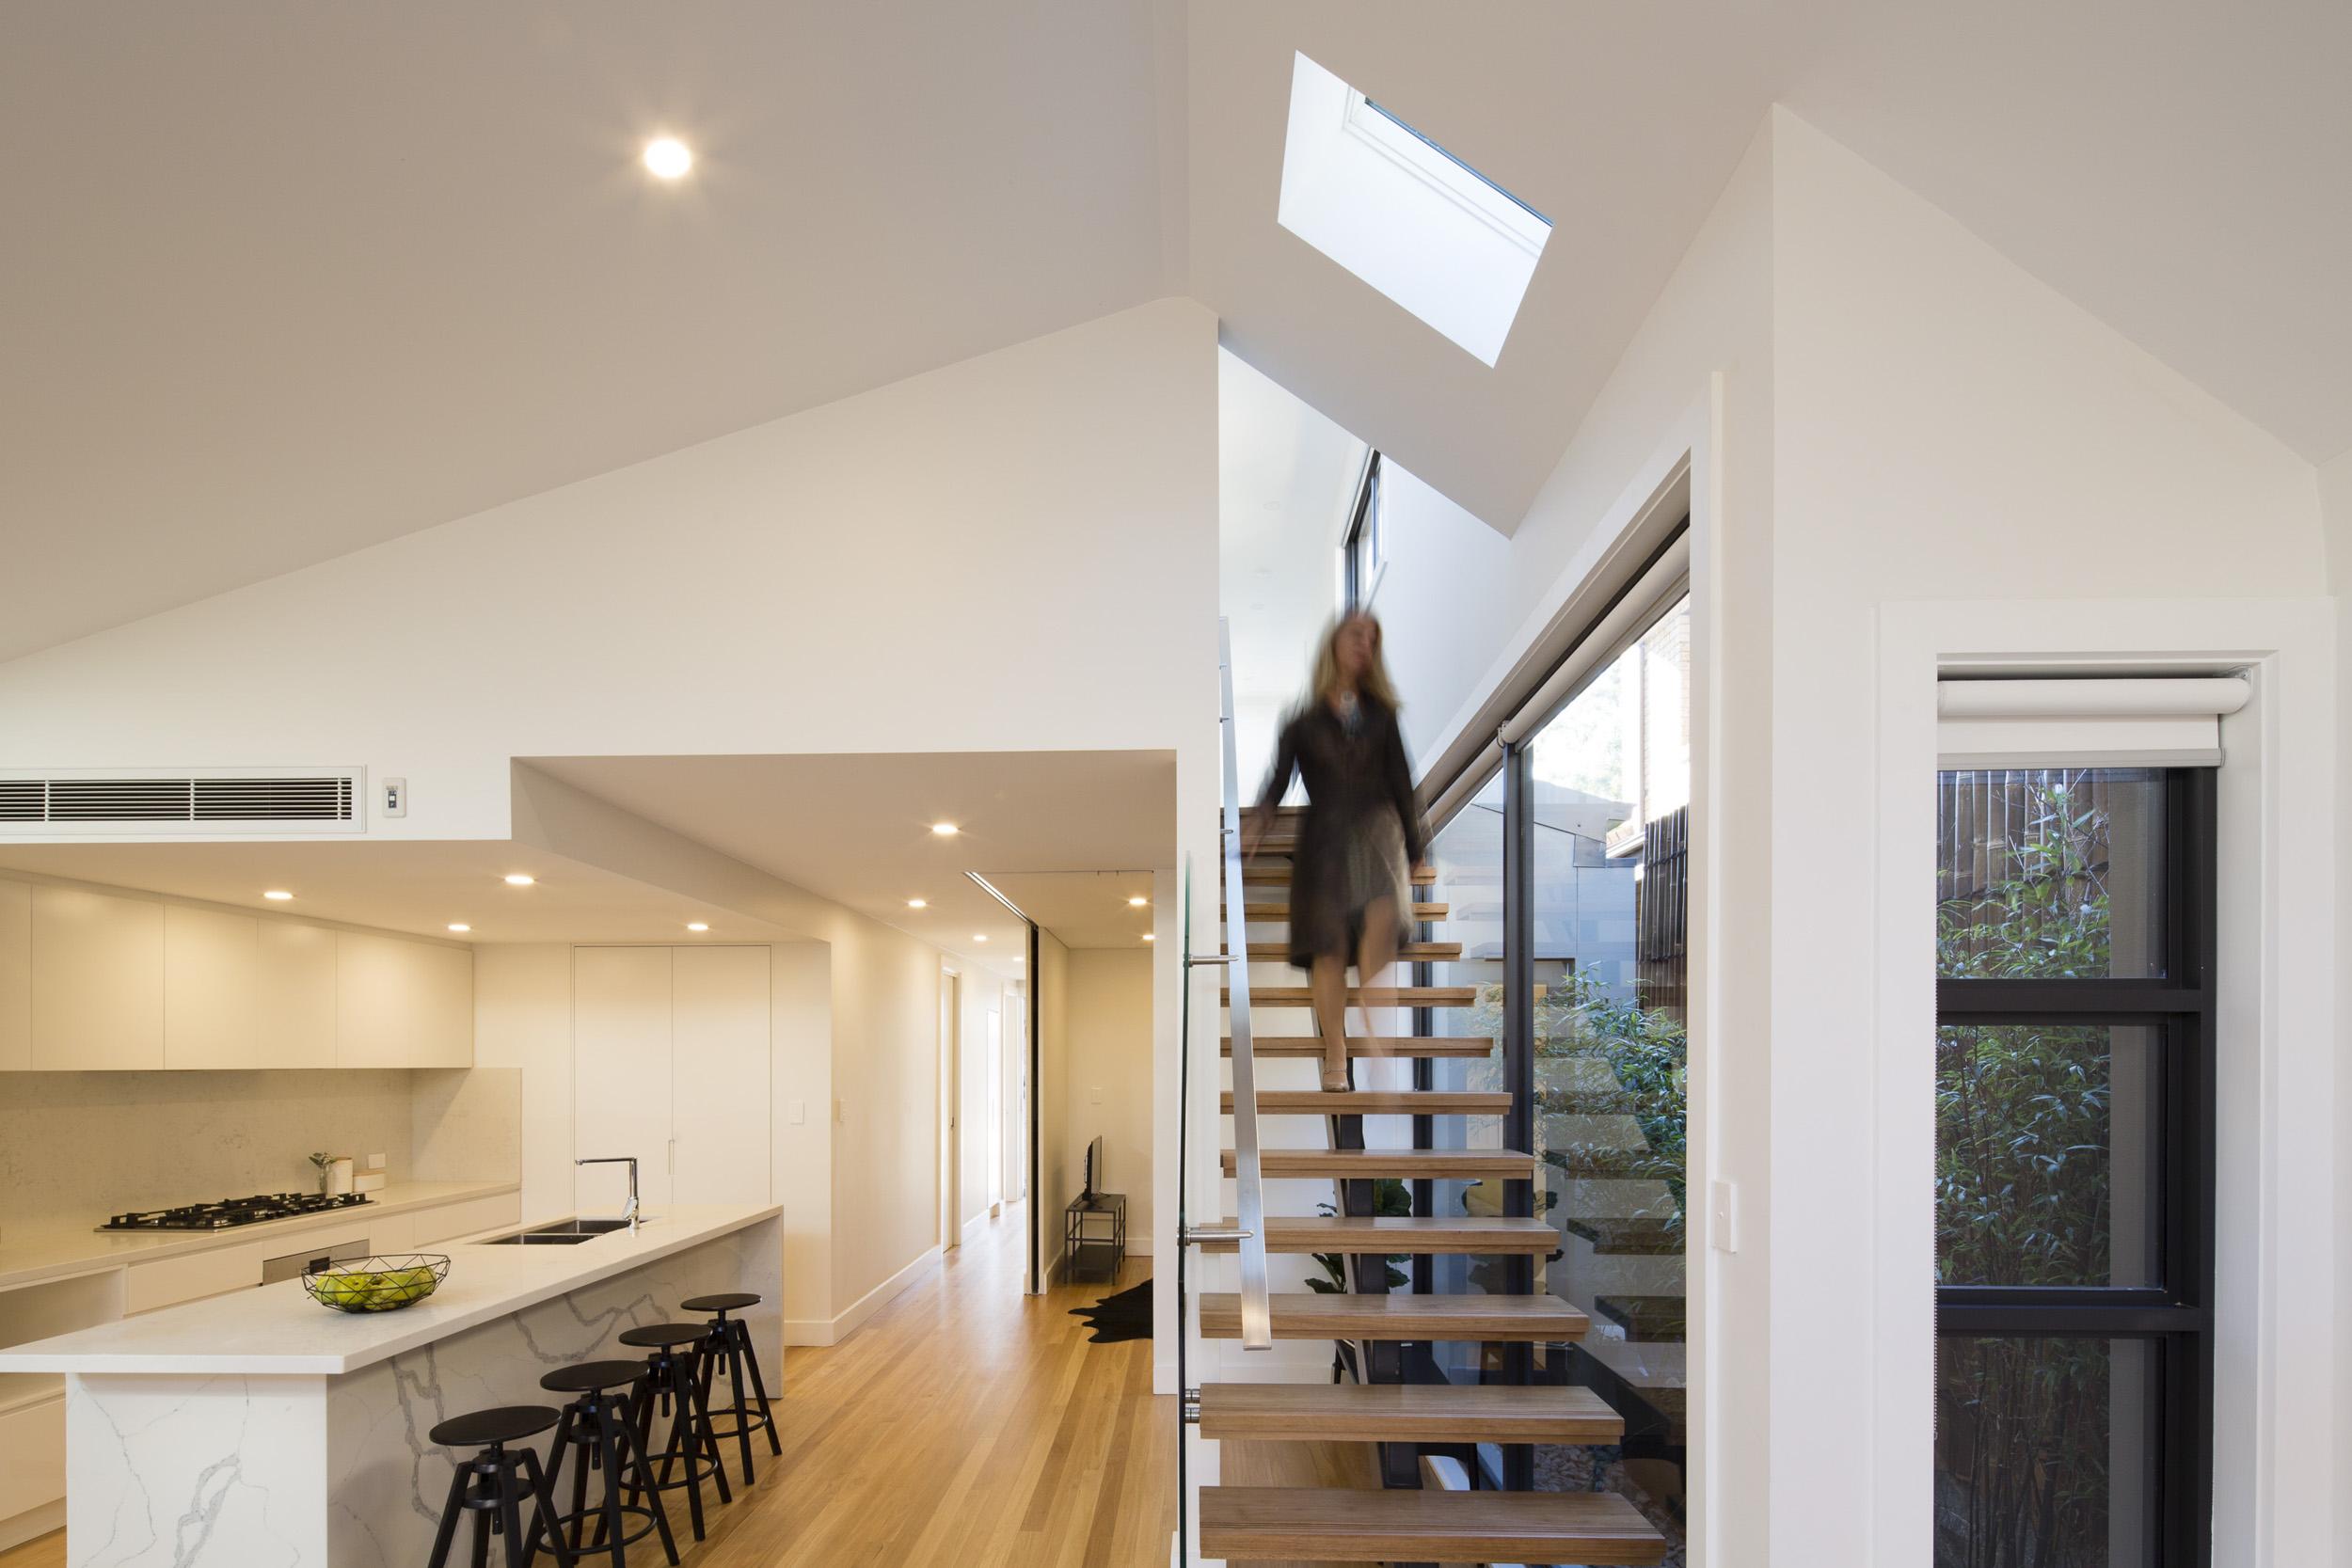 house_photographer_sydney_ns_studio_architects_08.jpg